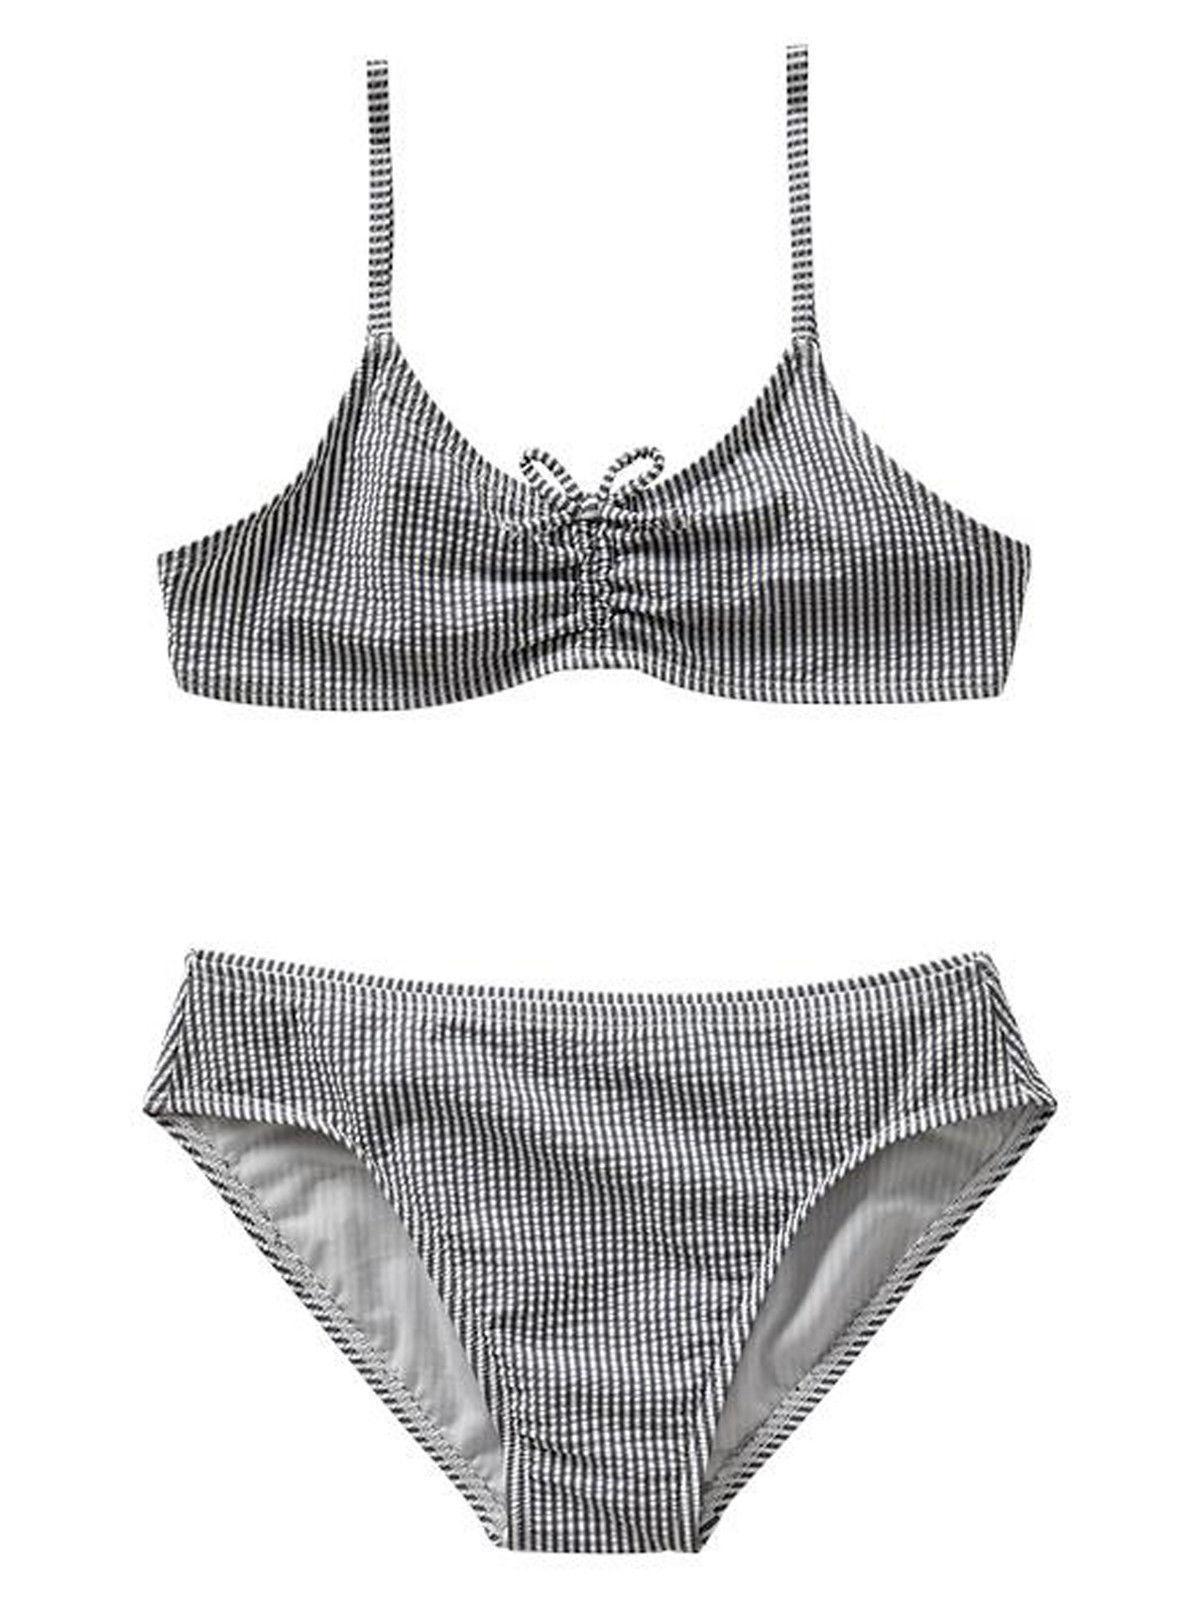 69fca01db7 GAP Kids Girls Swimsuit Bikini 6 7 Navy Blue and 50 similar items